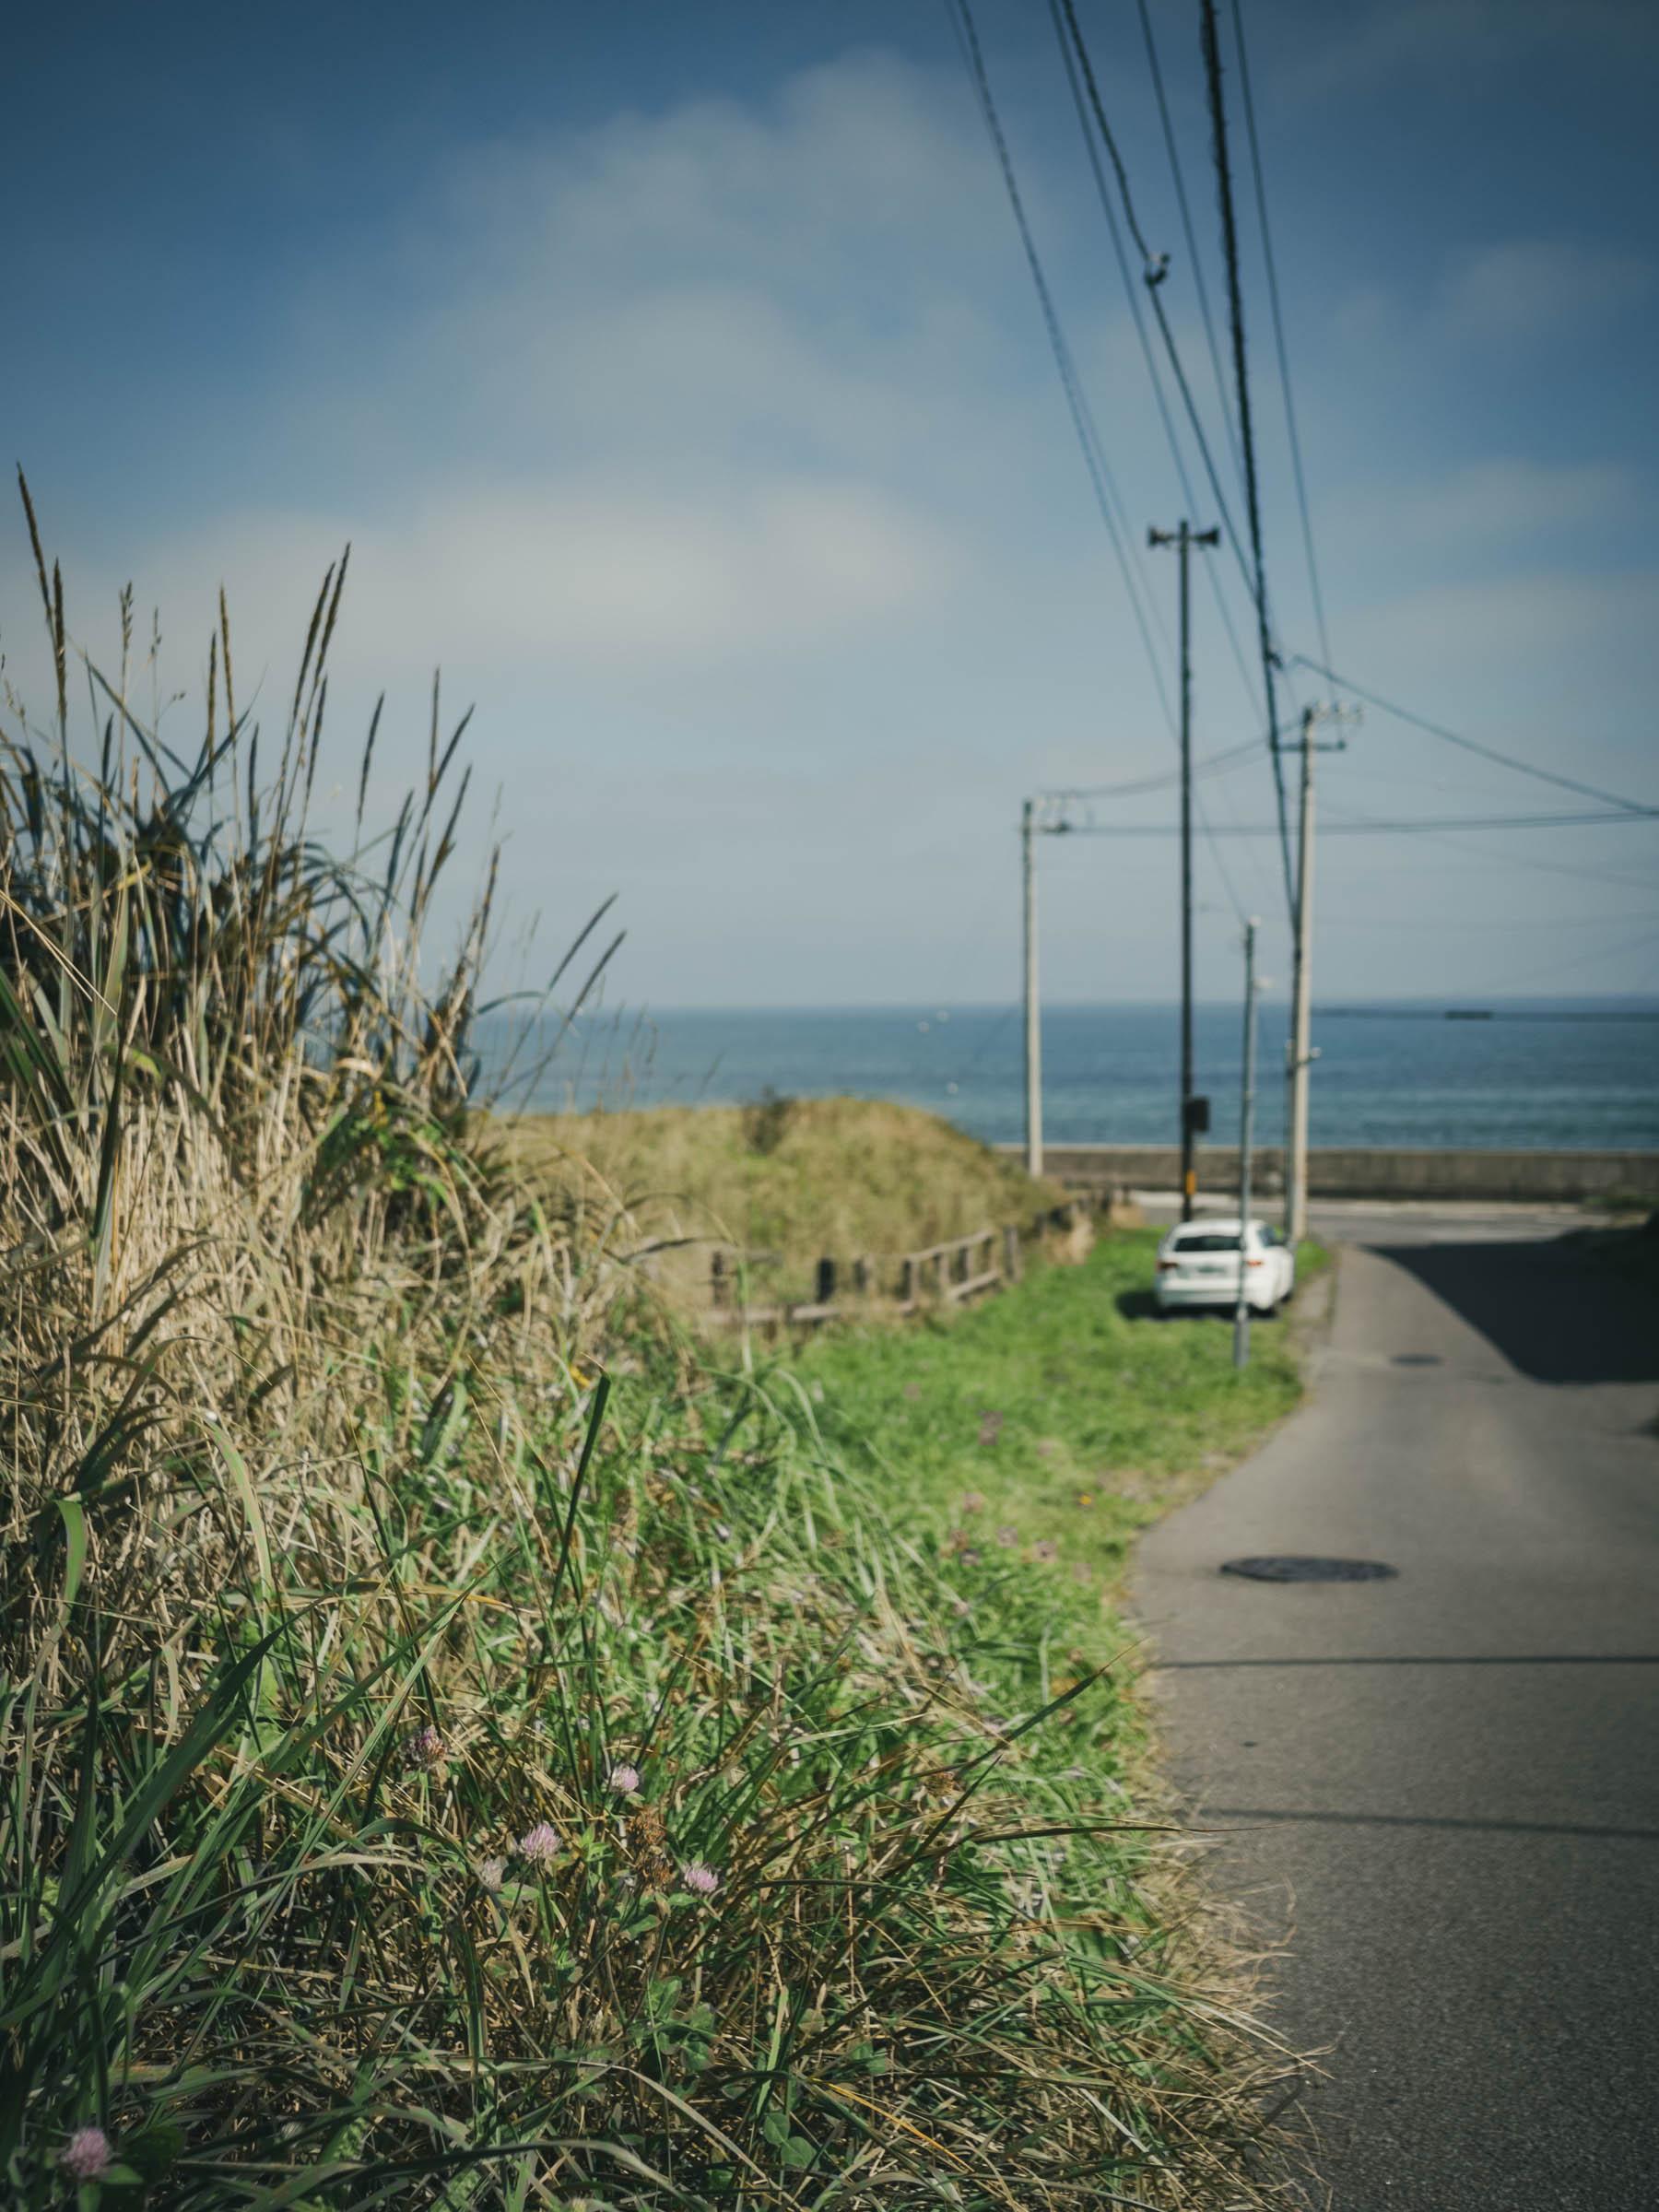 初秋の大森浜 DMC-GX8 + LEICA DG 15mm